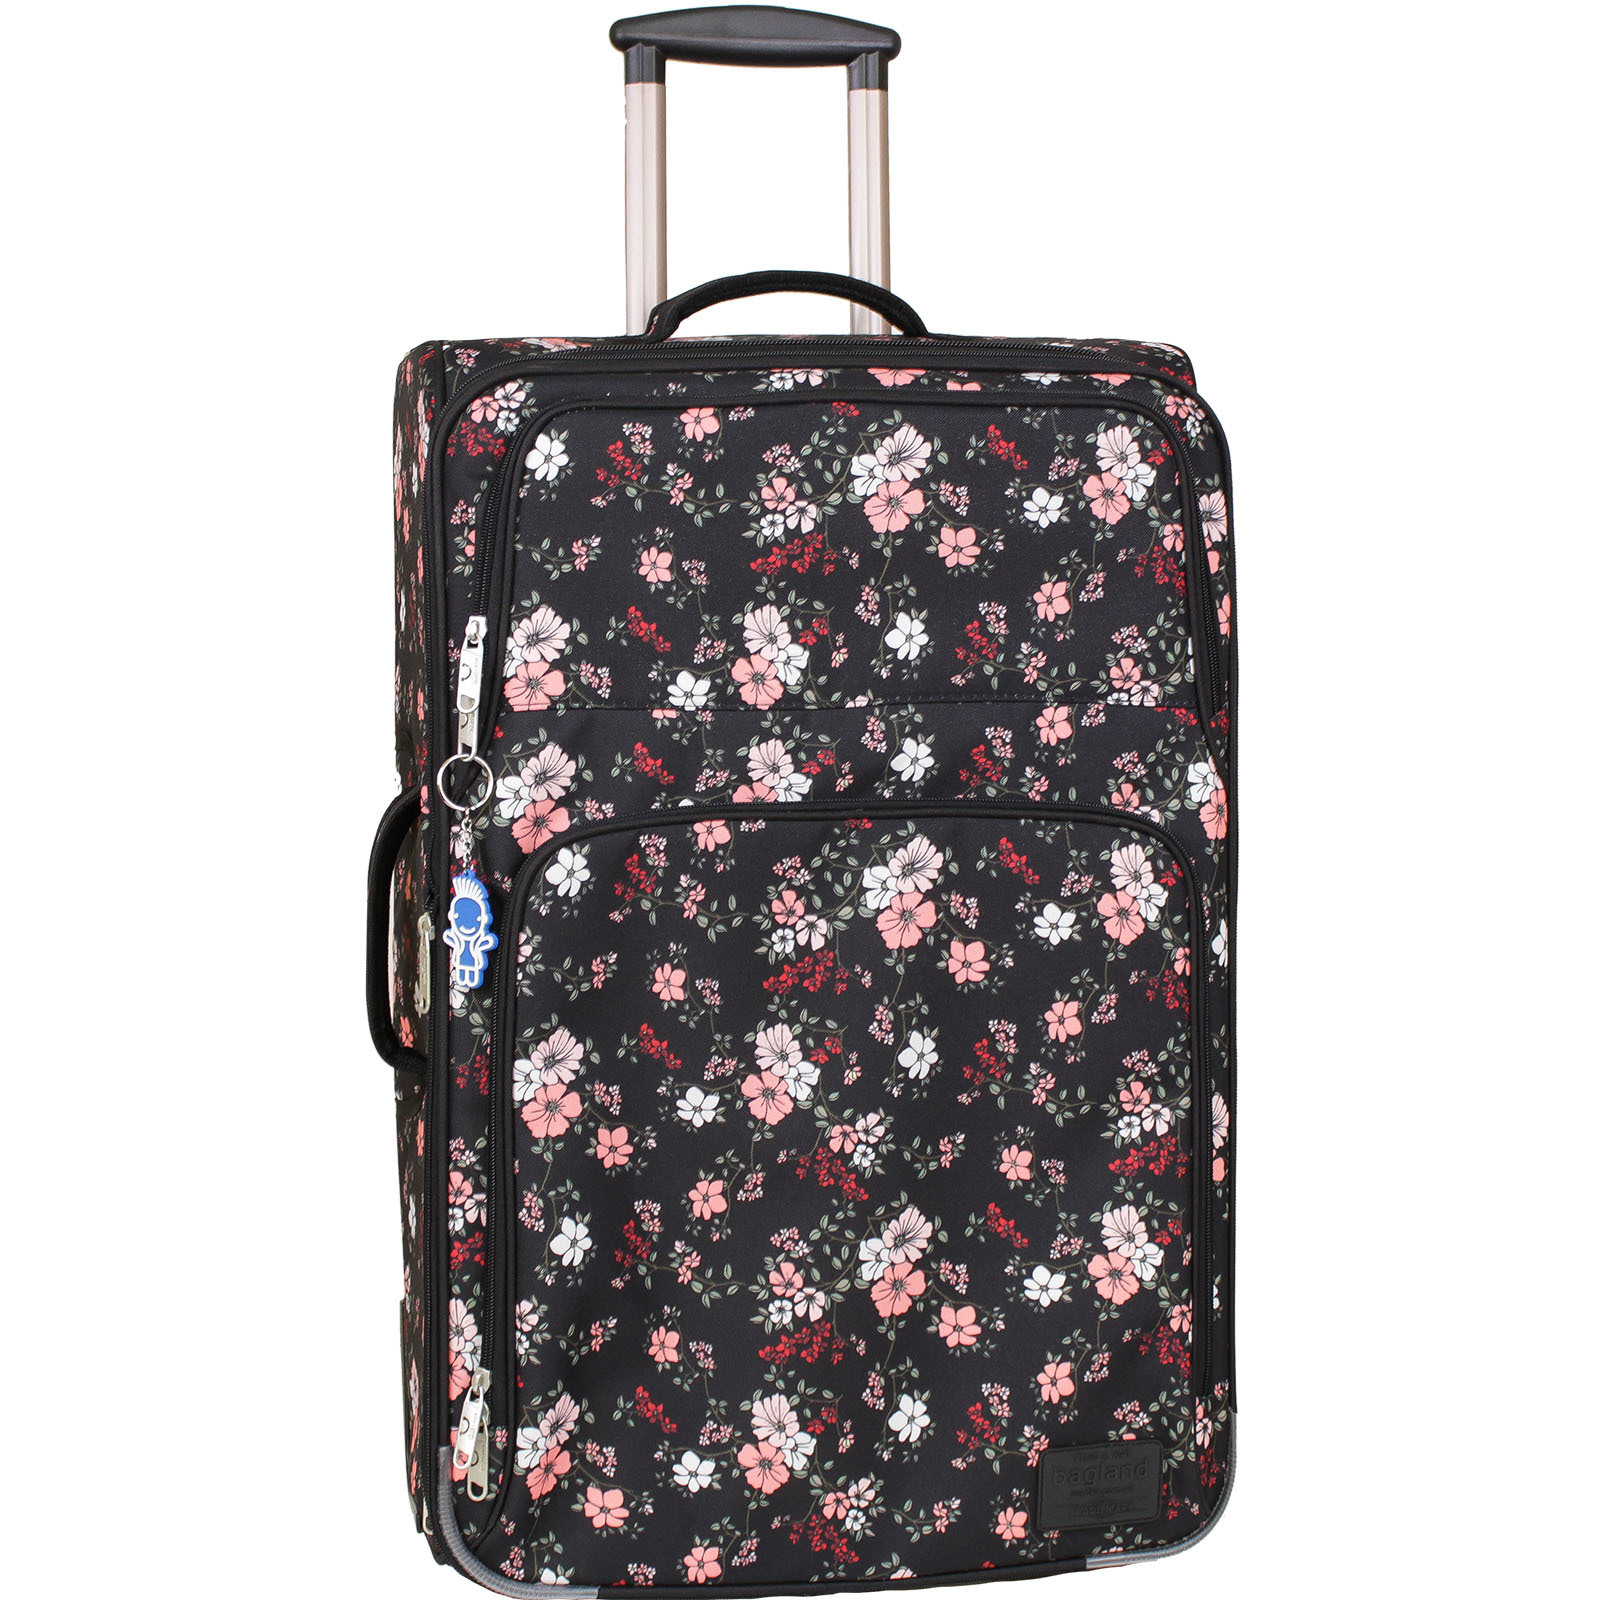 Дорожные чемоданы Чемодан Bagland Леон большой дизайн 70 л. сублімація 293 (0037666274) IMG_8581-1600_293.jpg